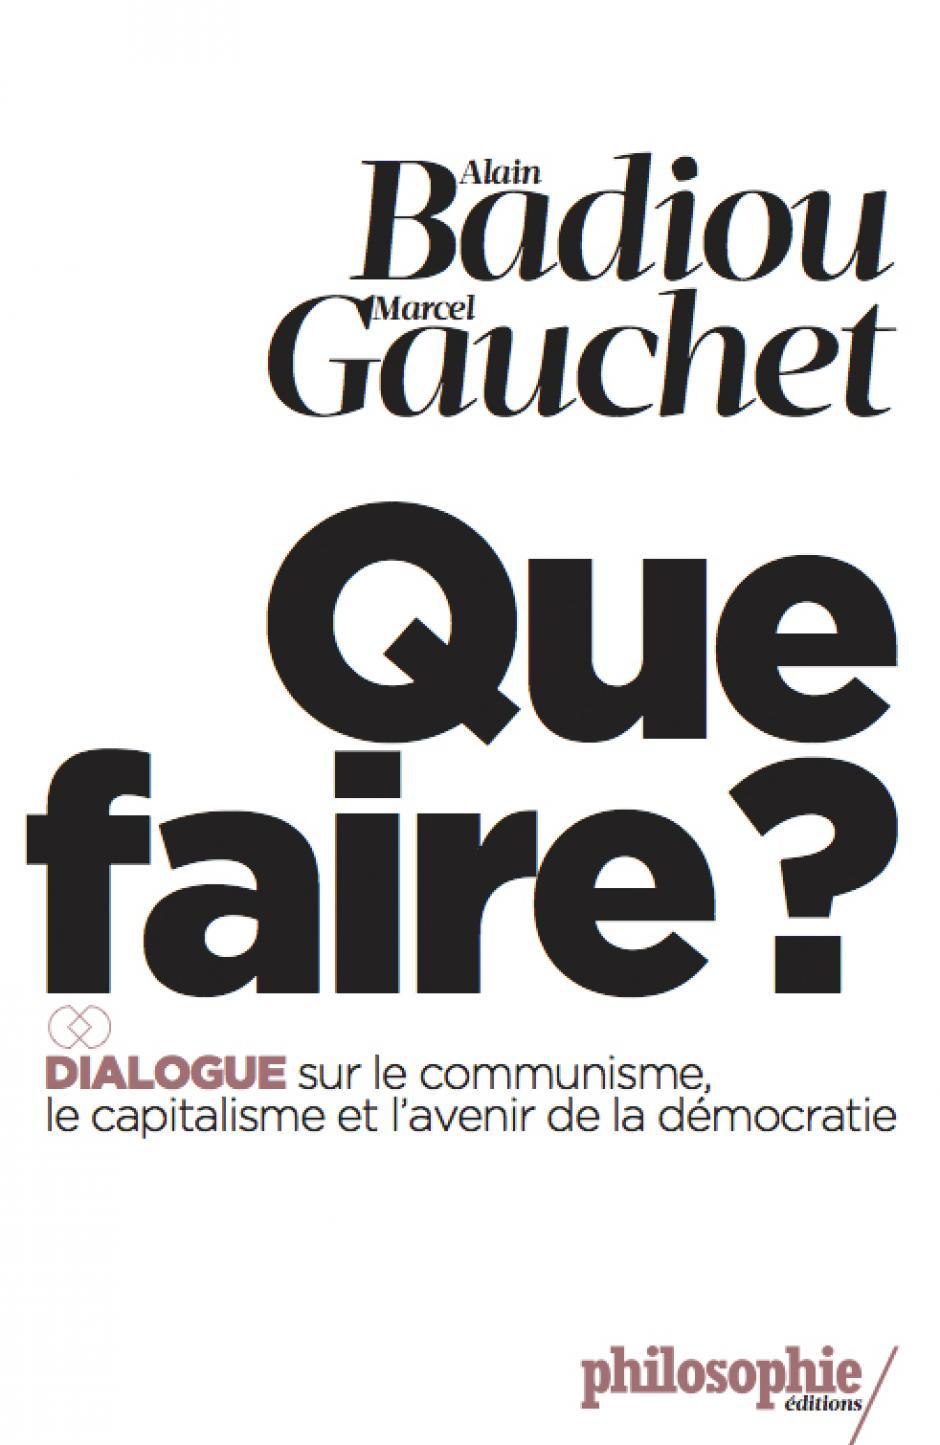 Que faire ?, Alain Badiou, Marcel Gauchet